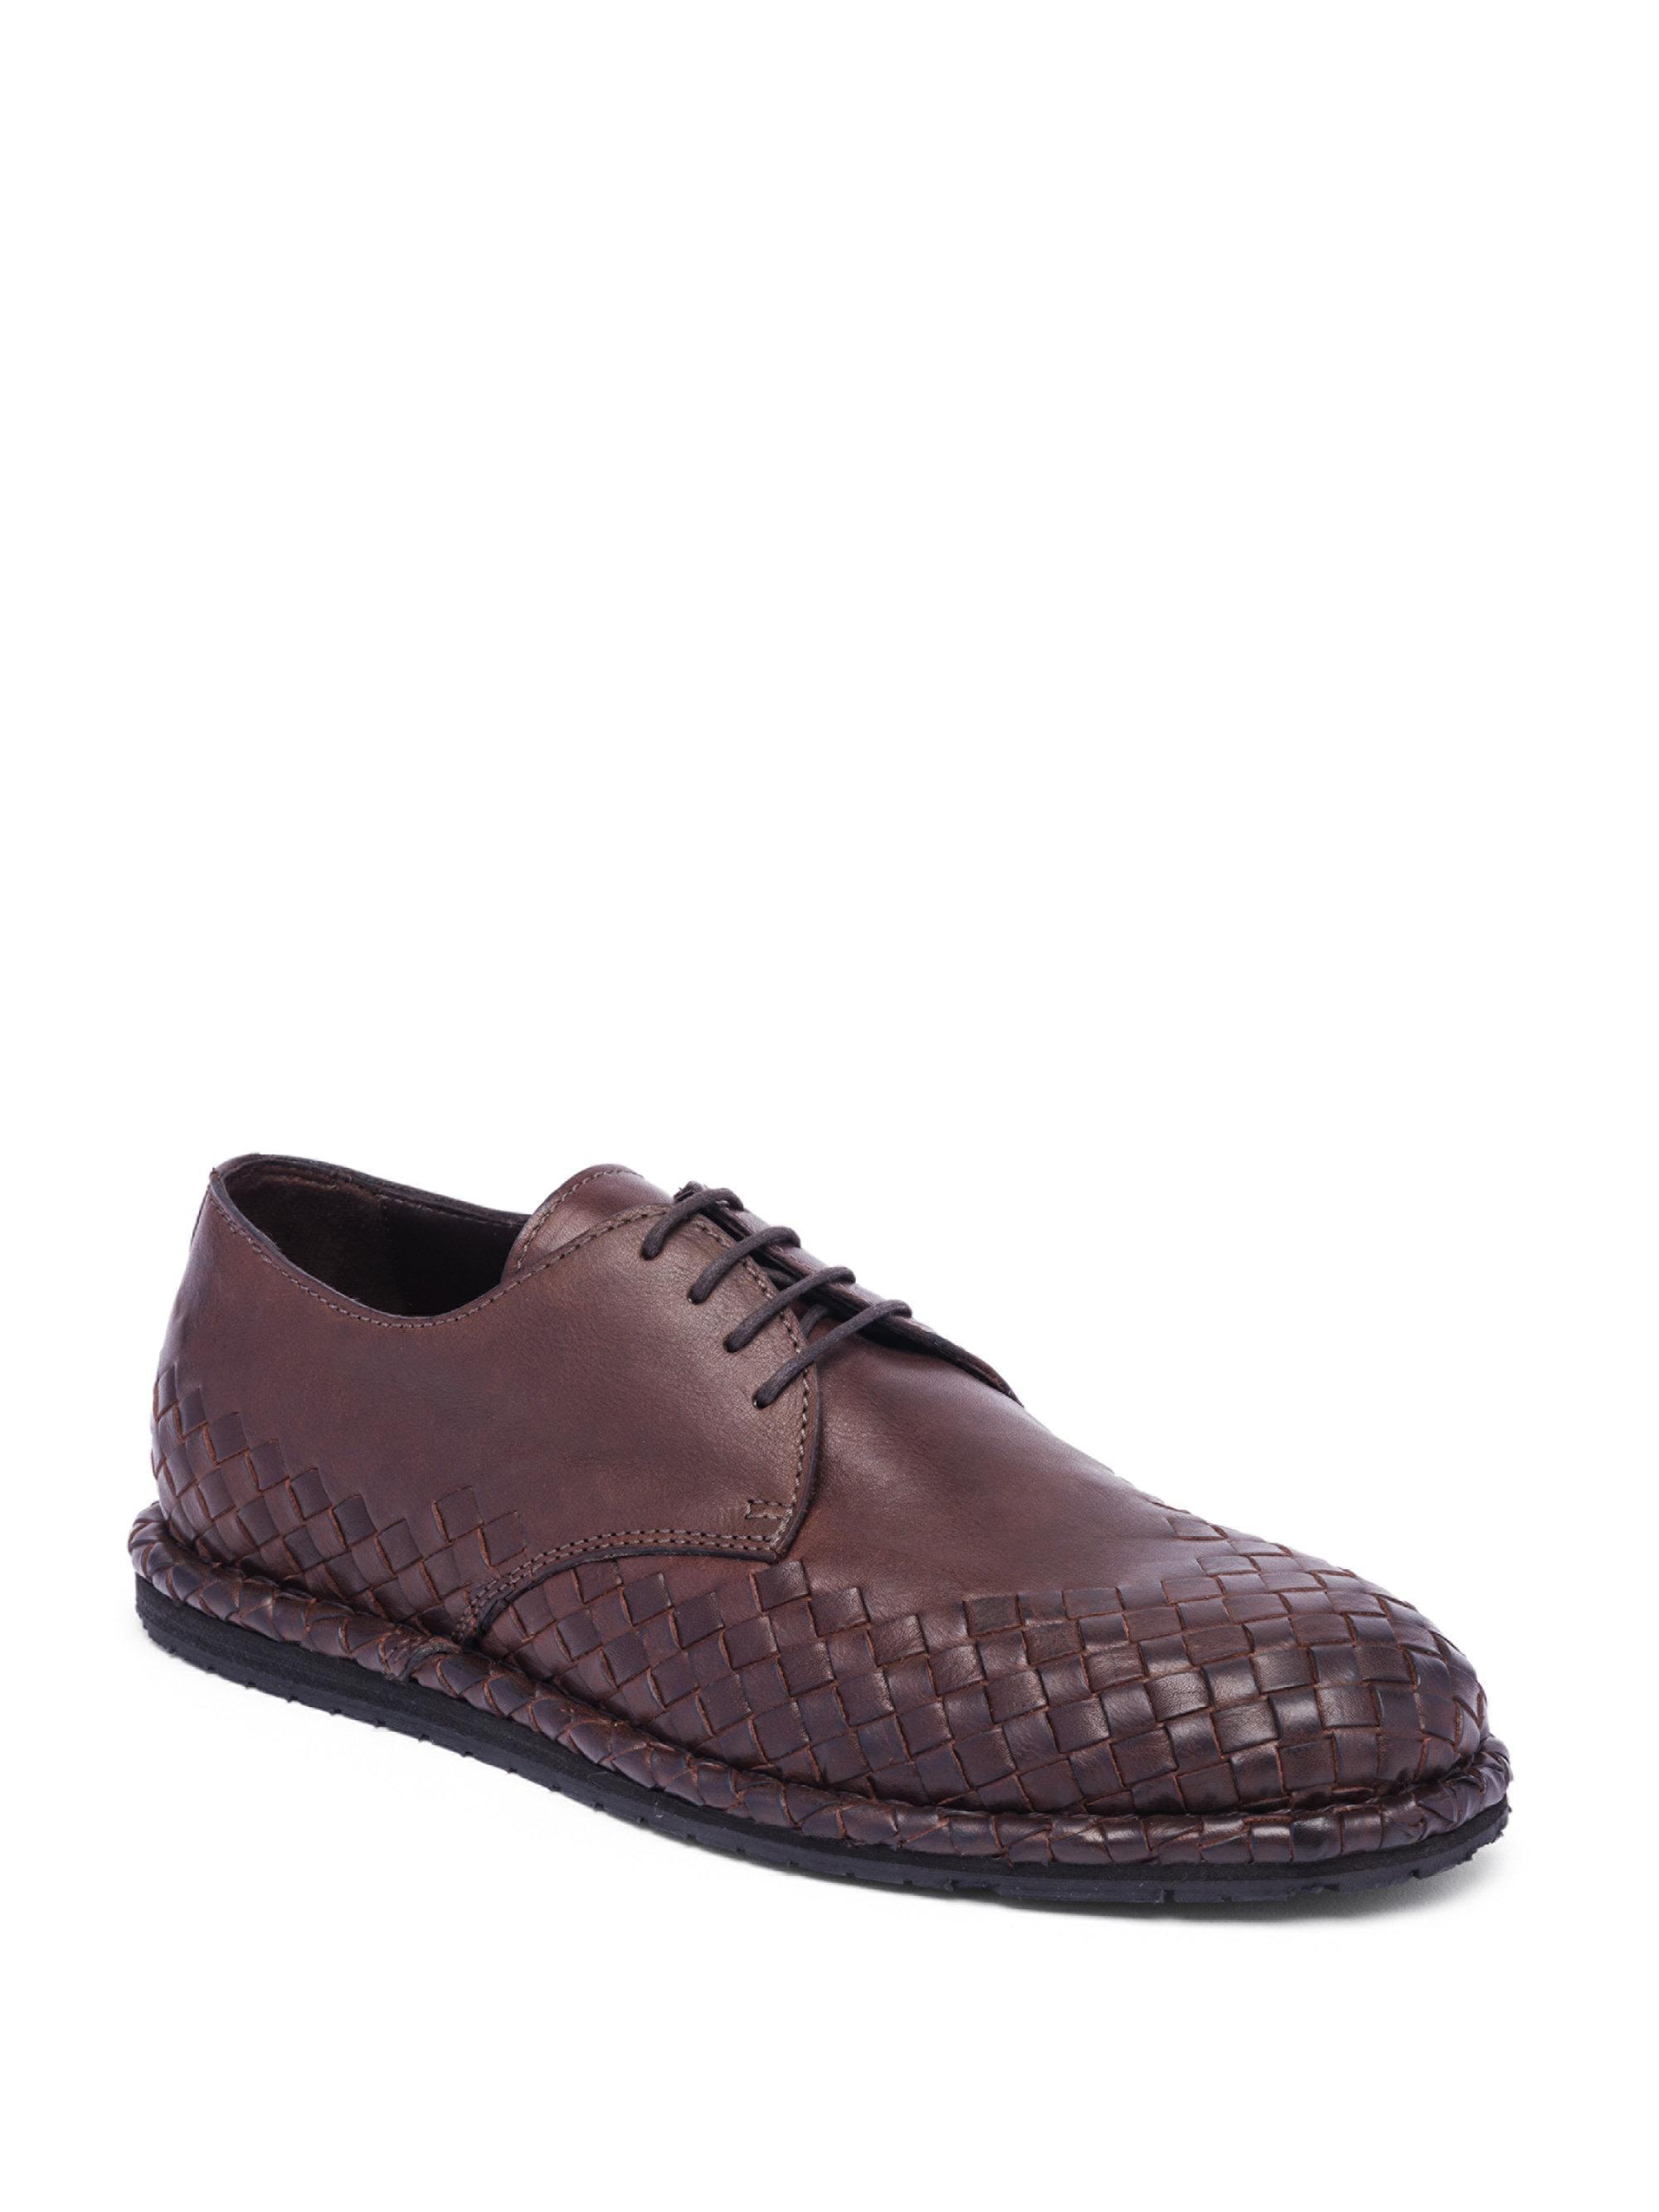 Bottega Veneta Intrecciato Leather Lace-Up Shoes wF1XgtMCG